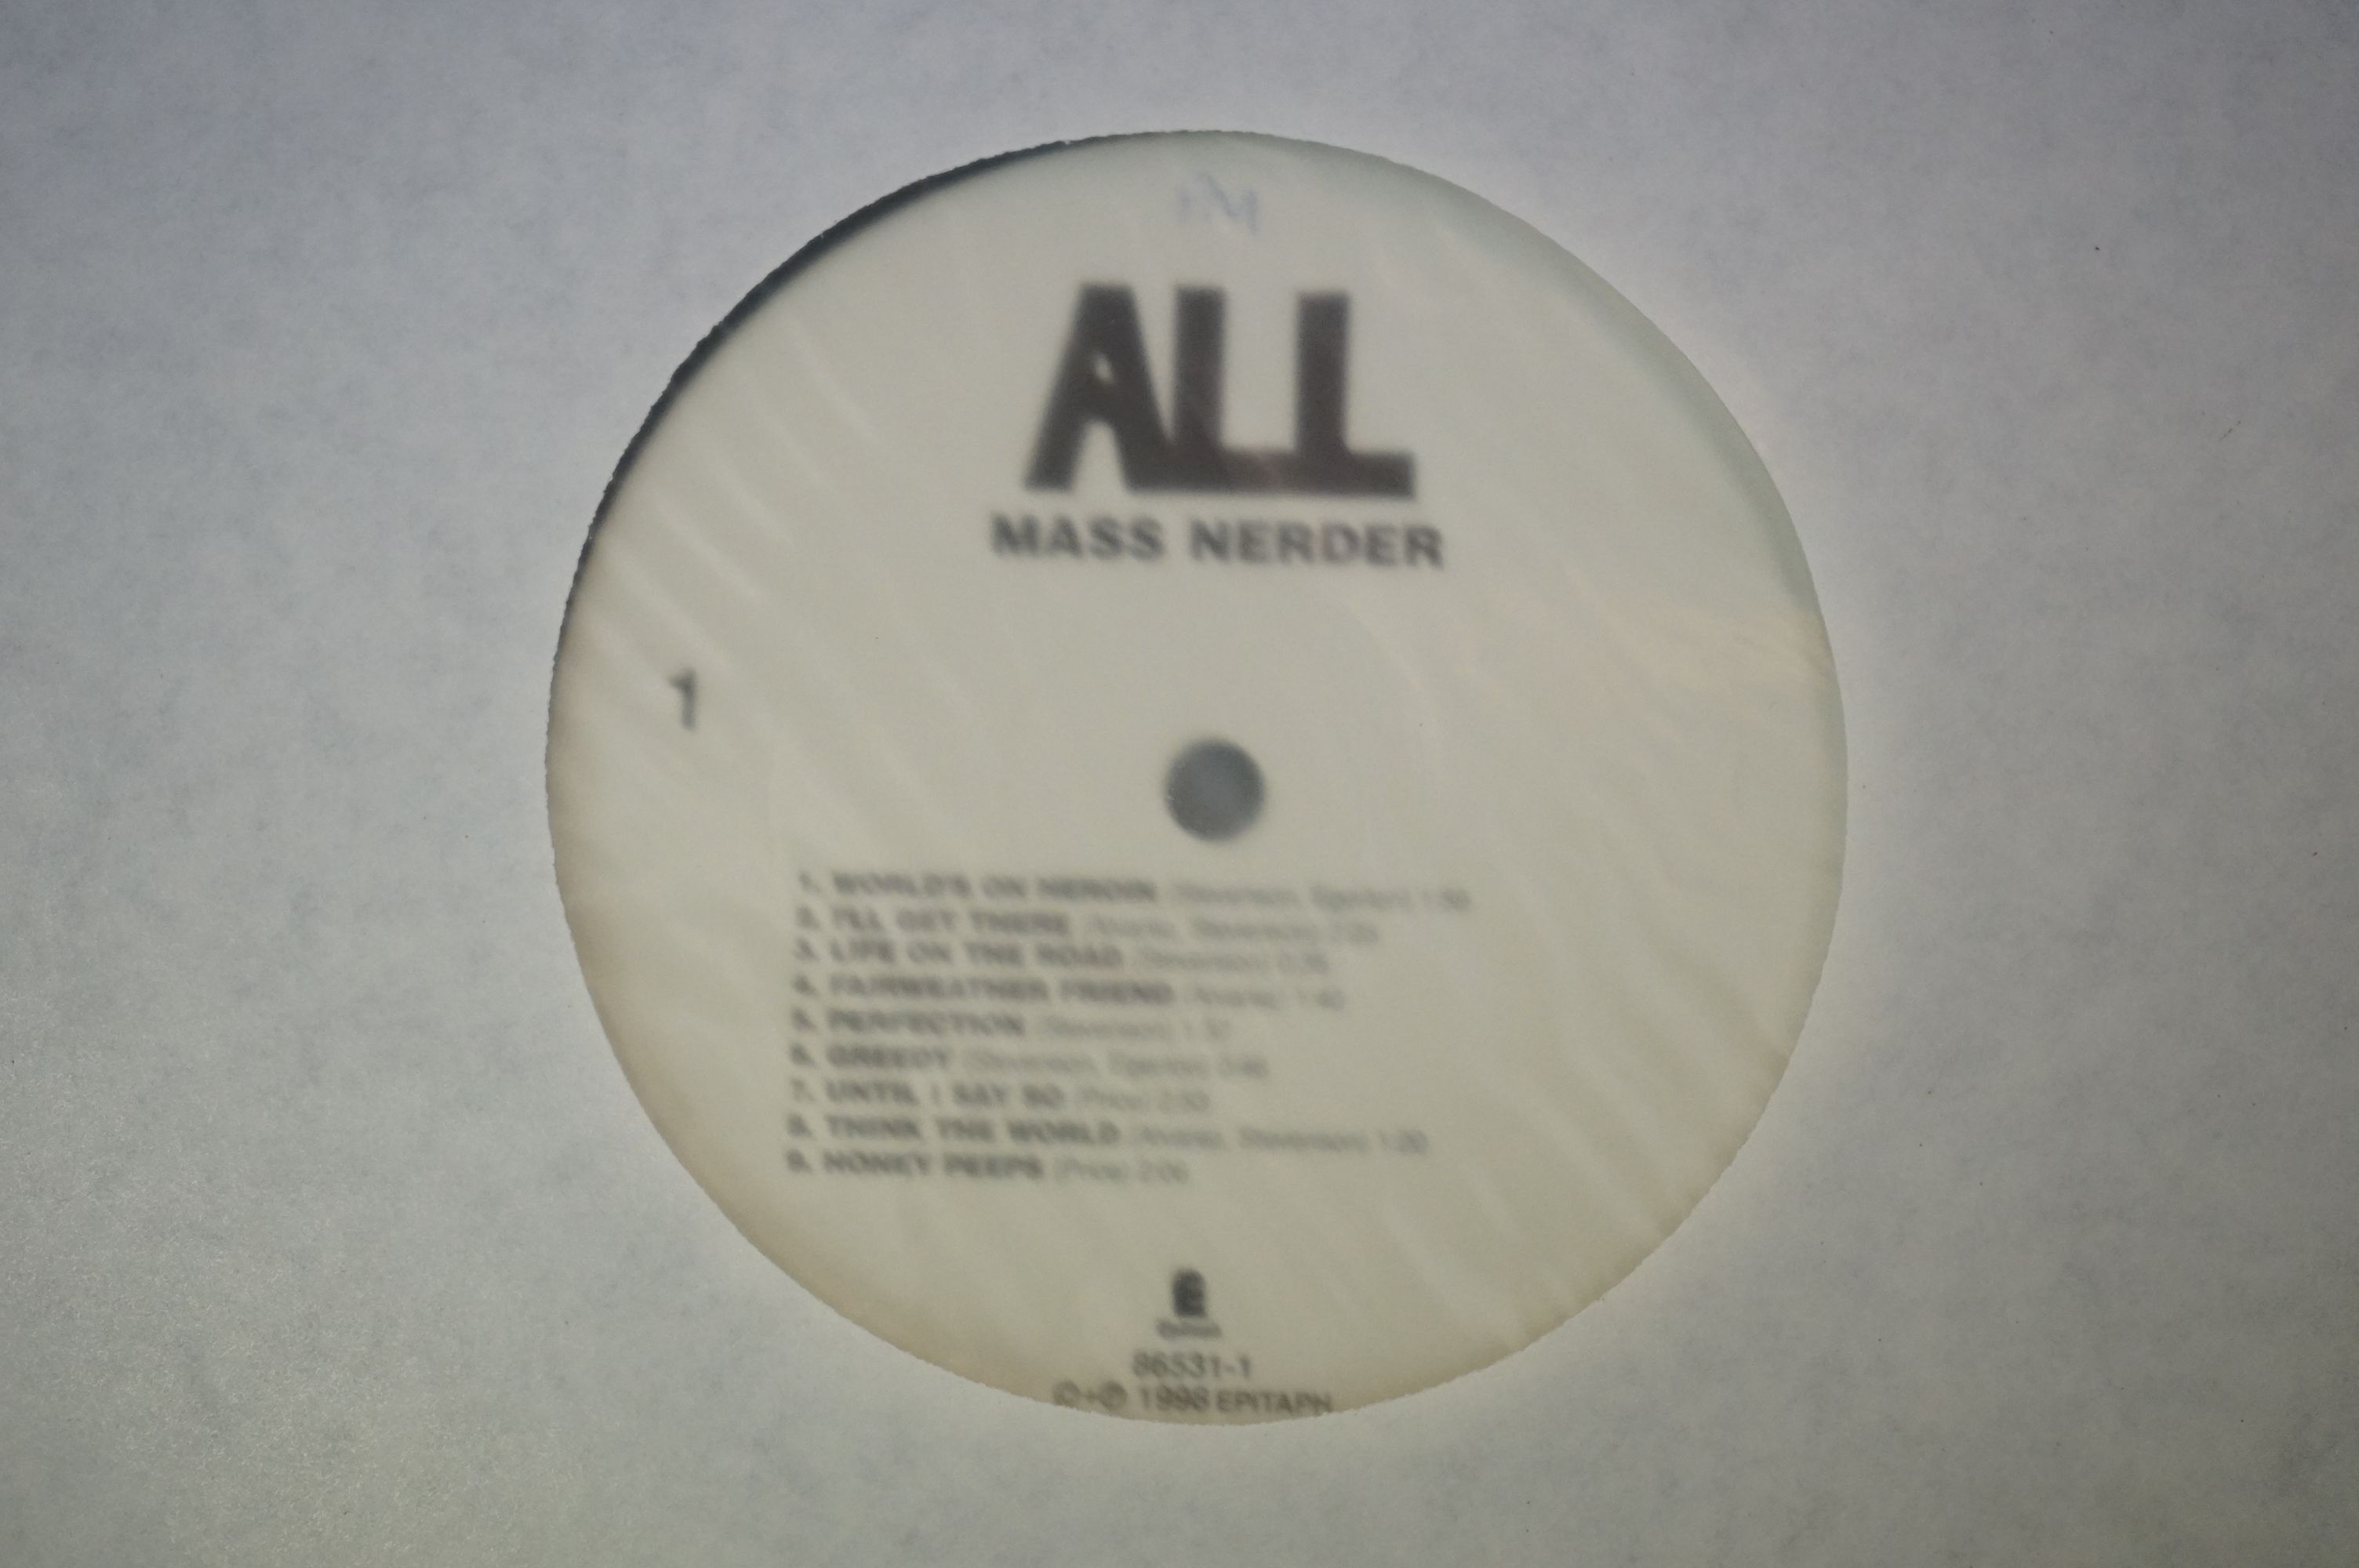 Vinyl - Fleetwood Mac, Kiln House (Reprise RSLP 9004) insert included, sleeve, insert and vinyl vg+ - Image 14 of 14